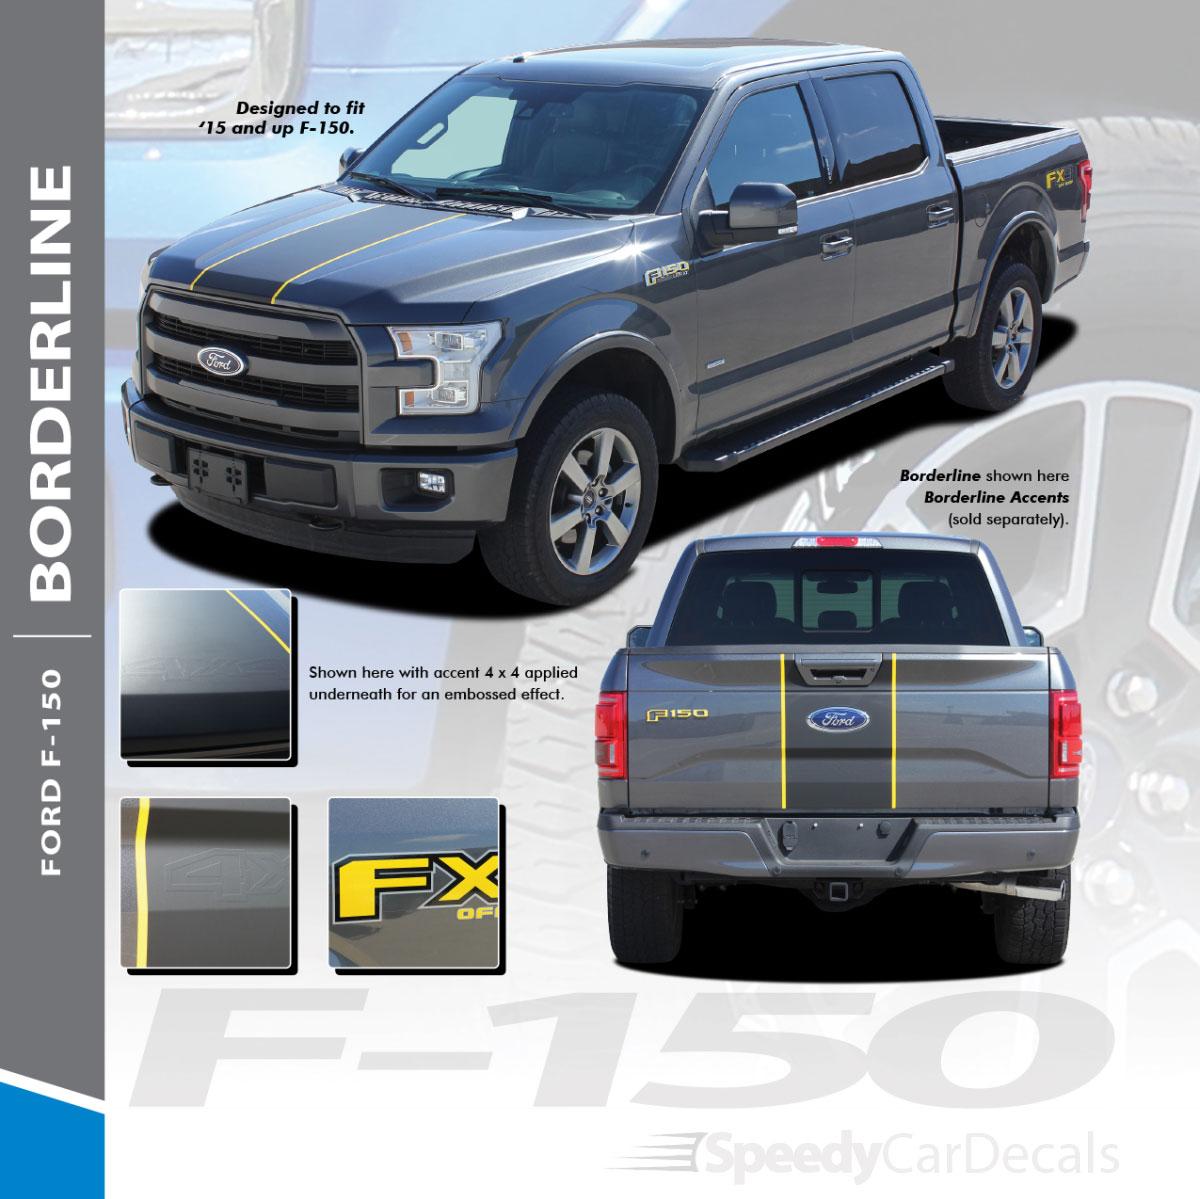 Best Ford F150 Truck Center Decals Bordeline 3m 2015 2018 2019